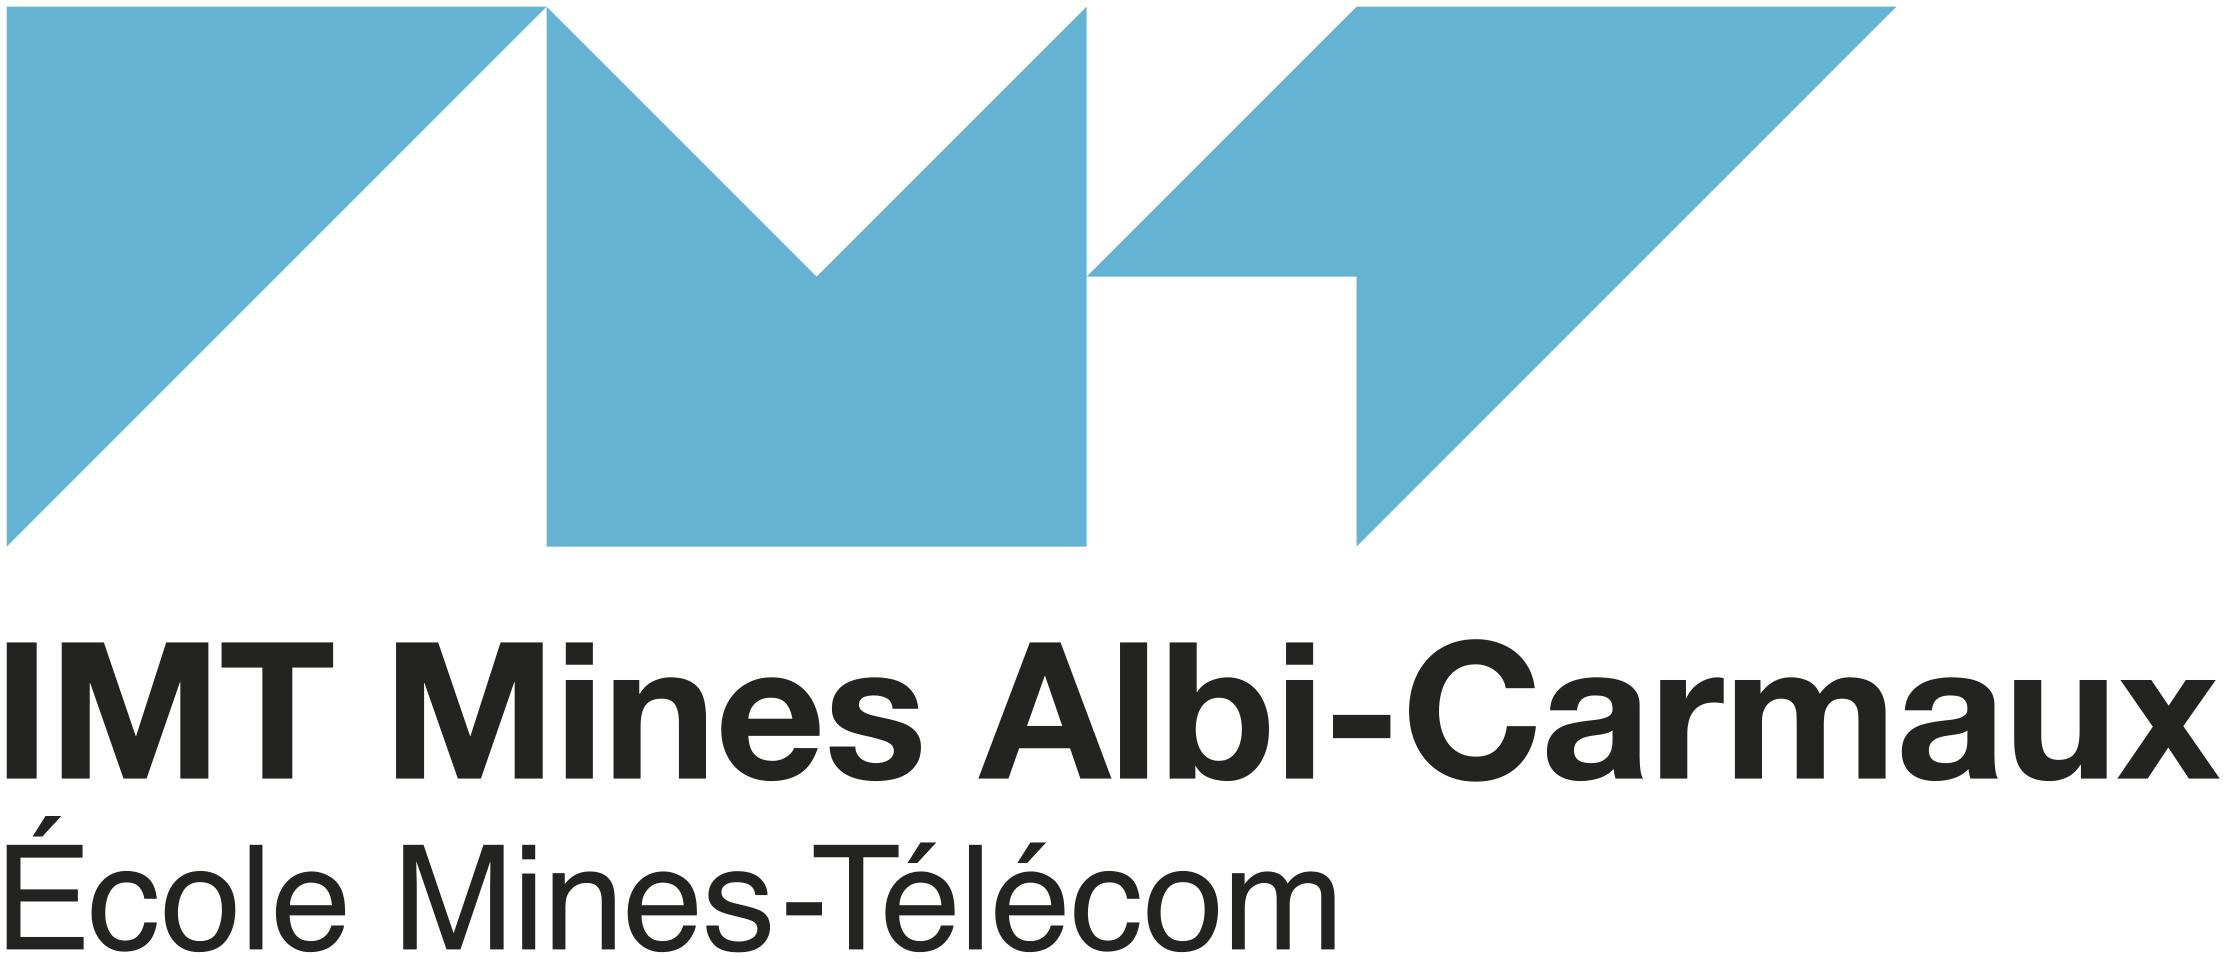 IMT Mines-Albi